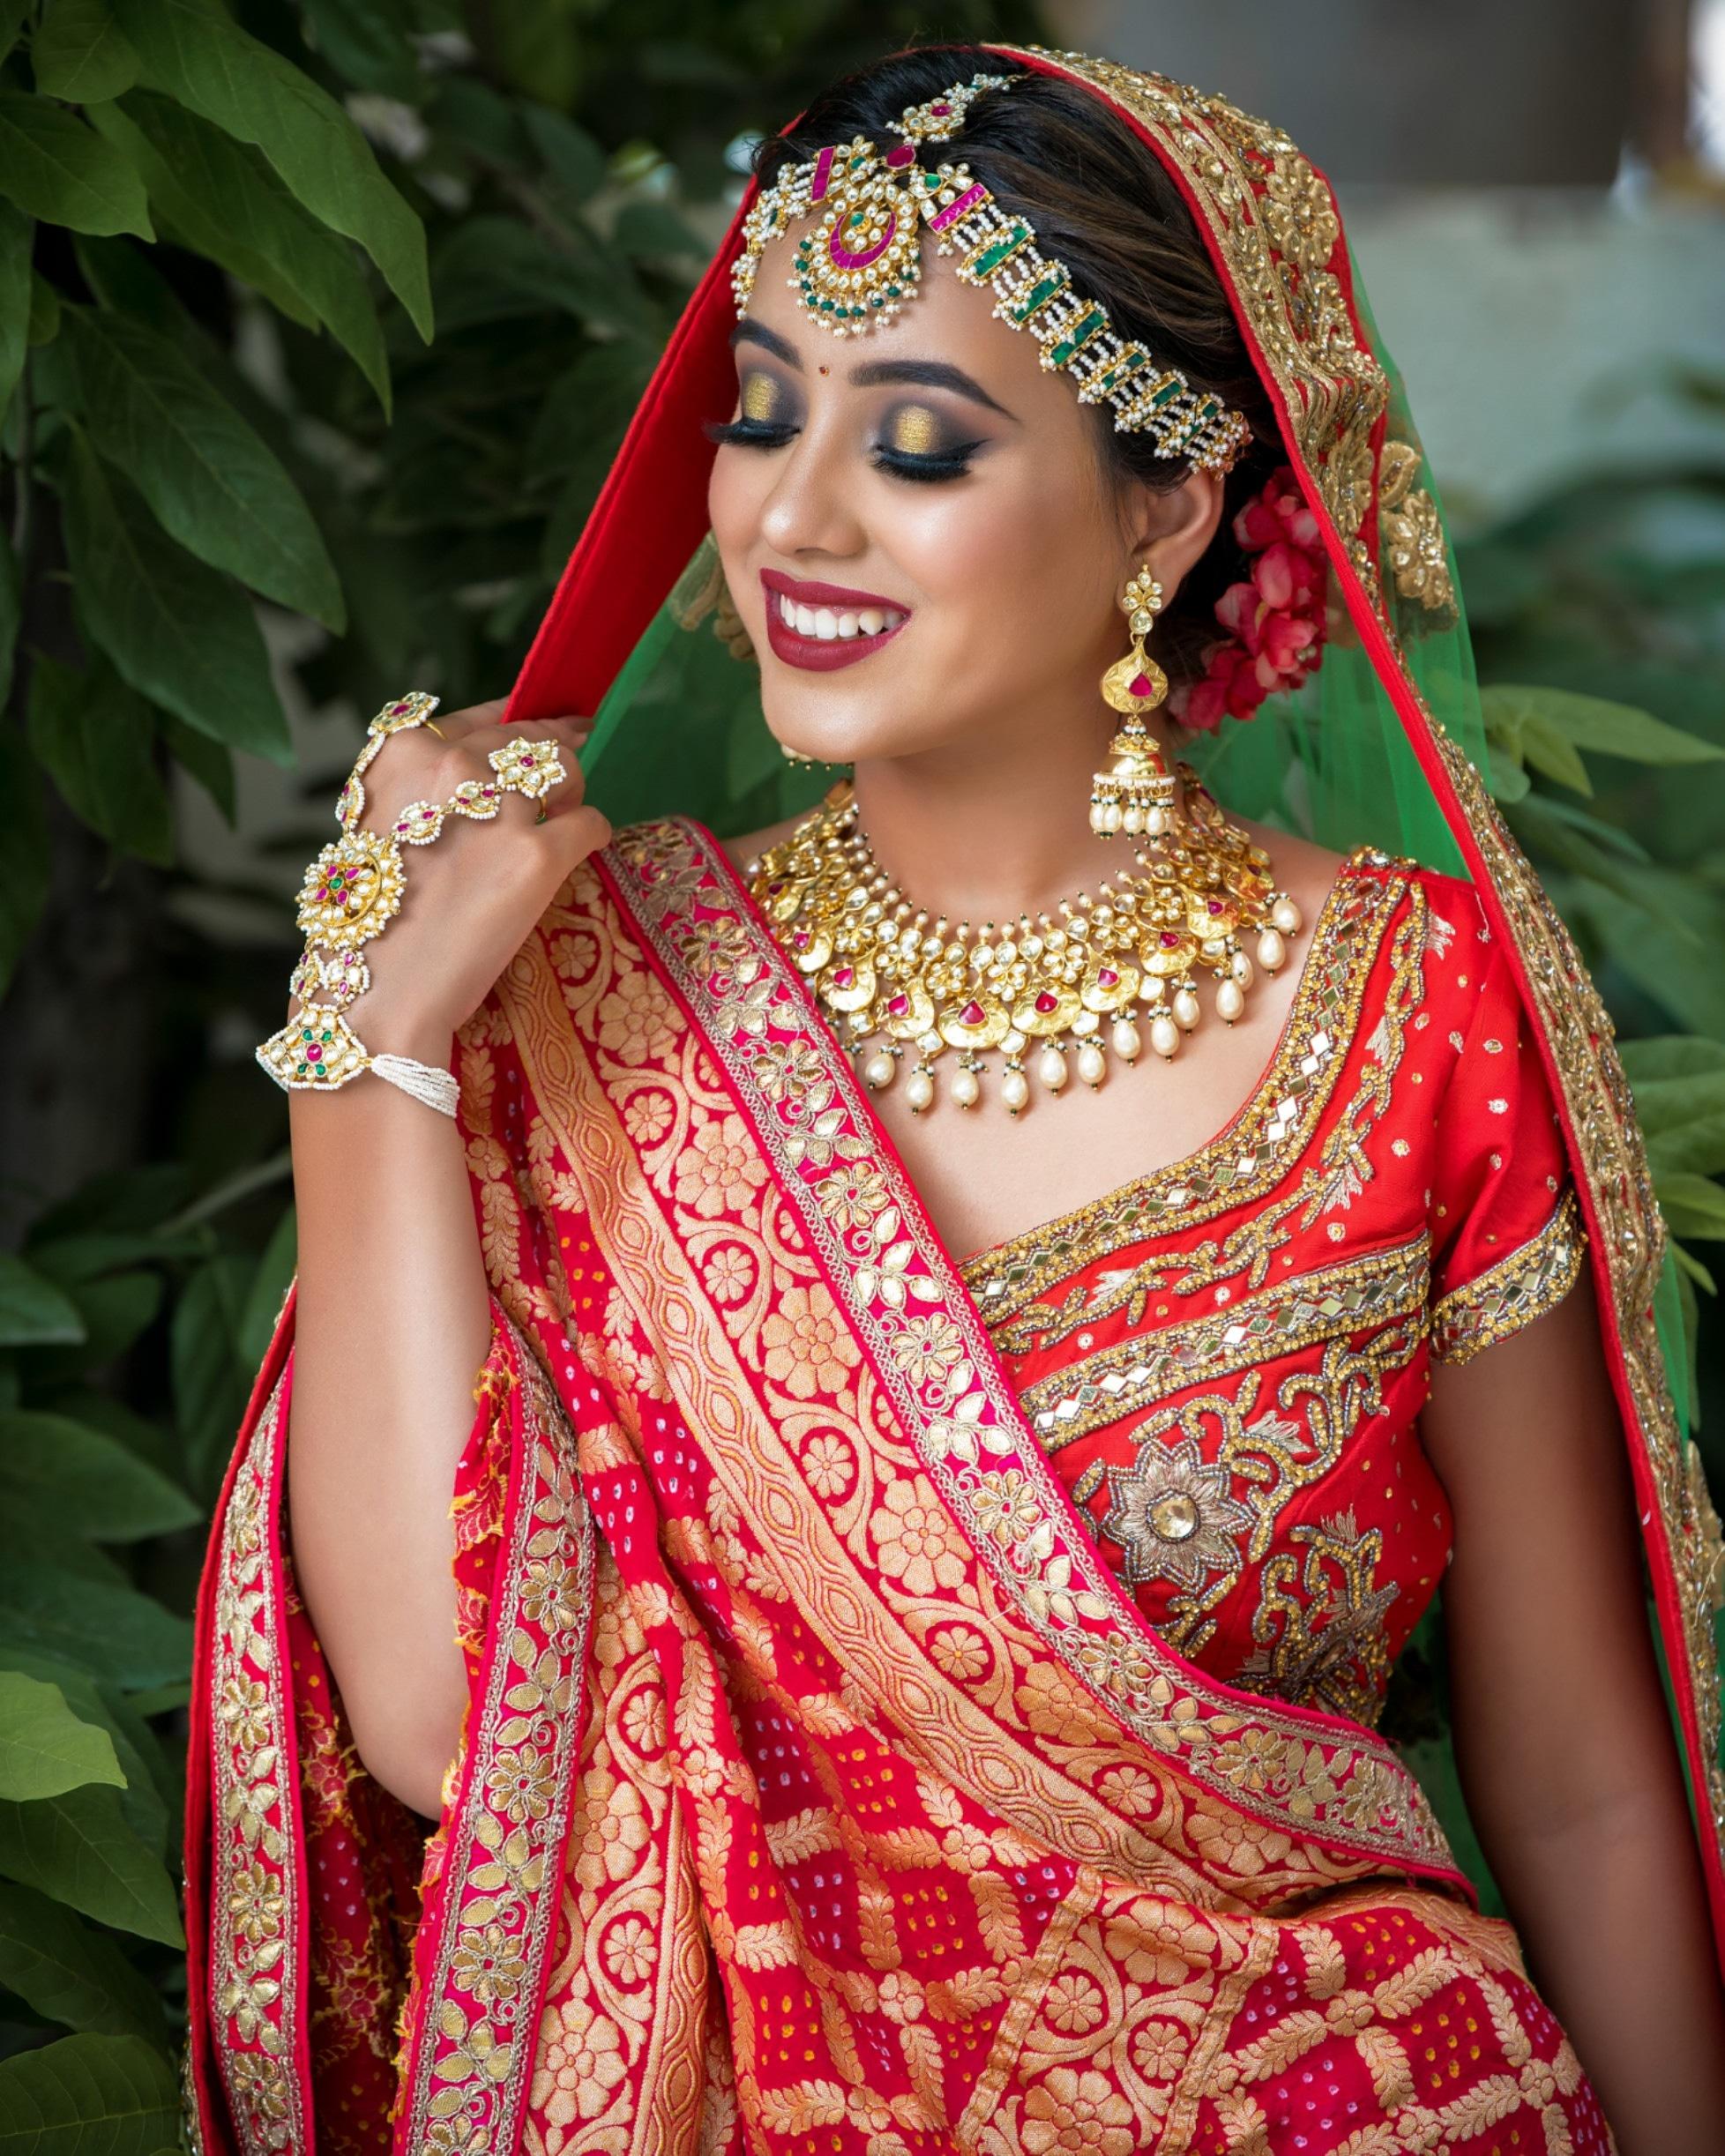 riddhi-trivedi-makeup-artist-ahmedabad